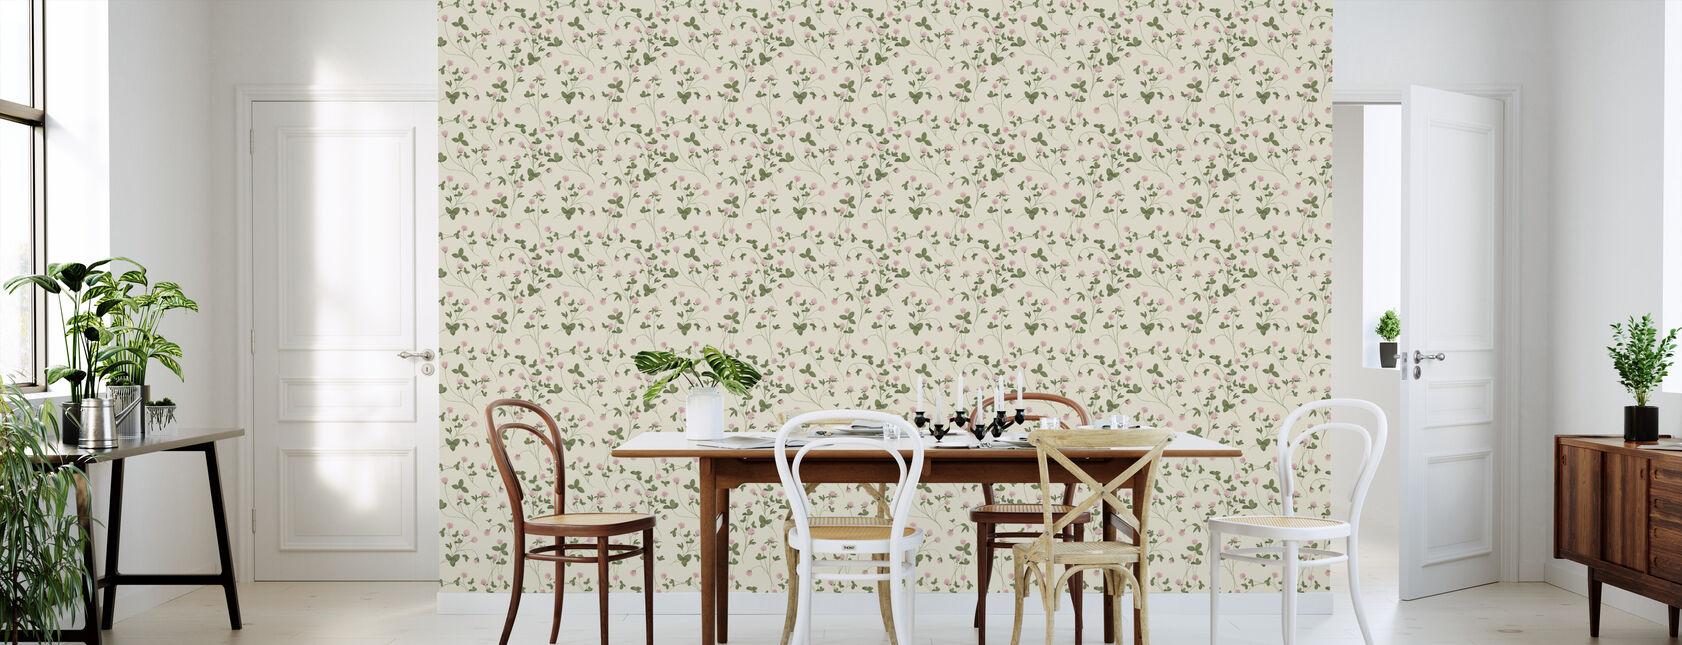 Clover Vanilla - Wallpaper - Kitchen